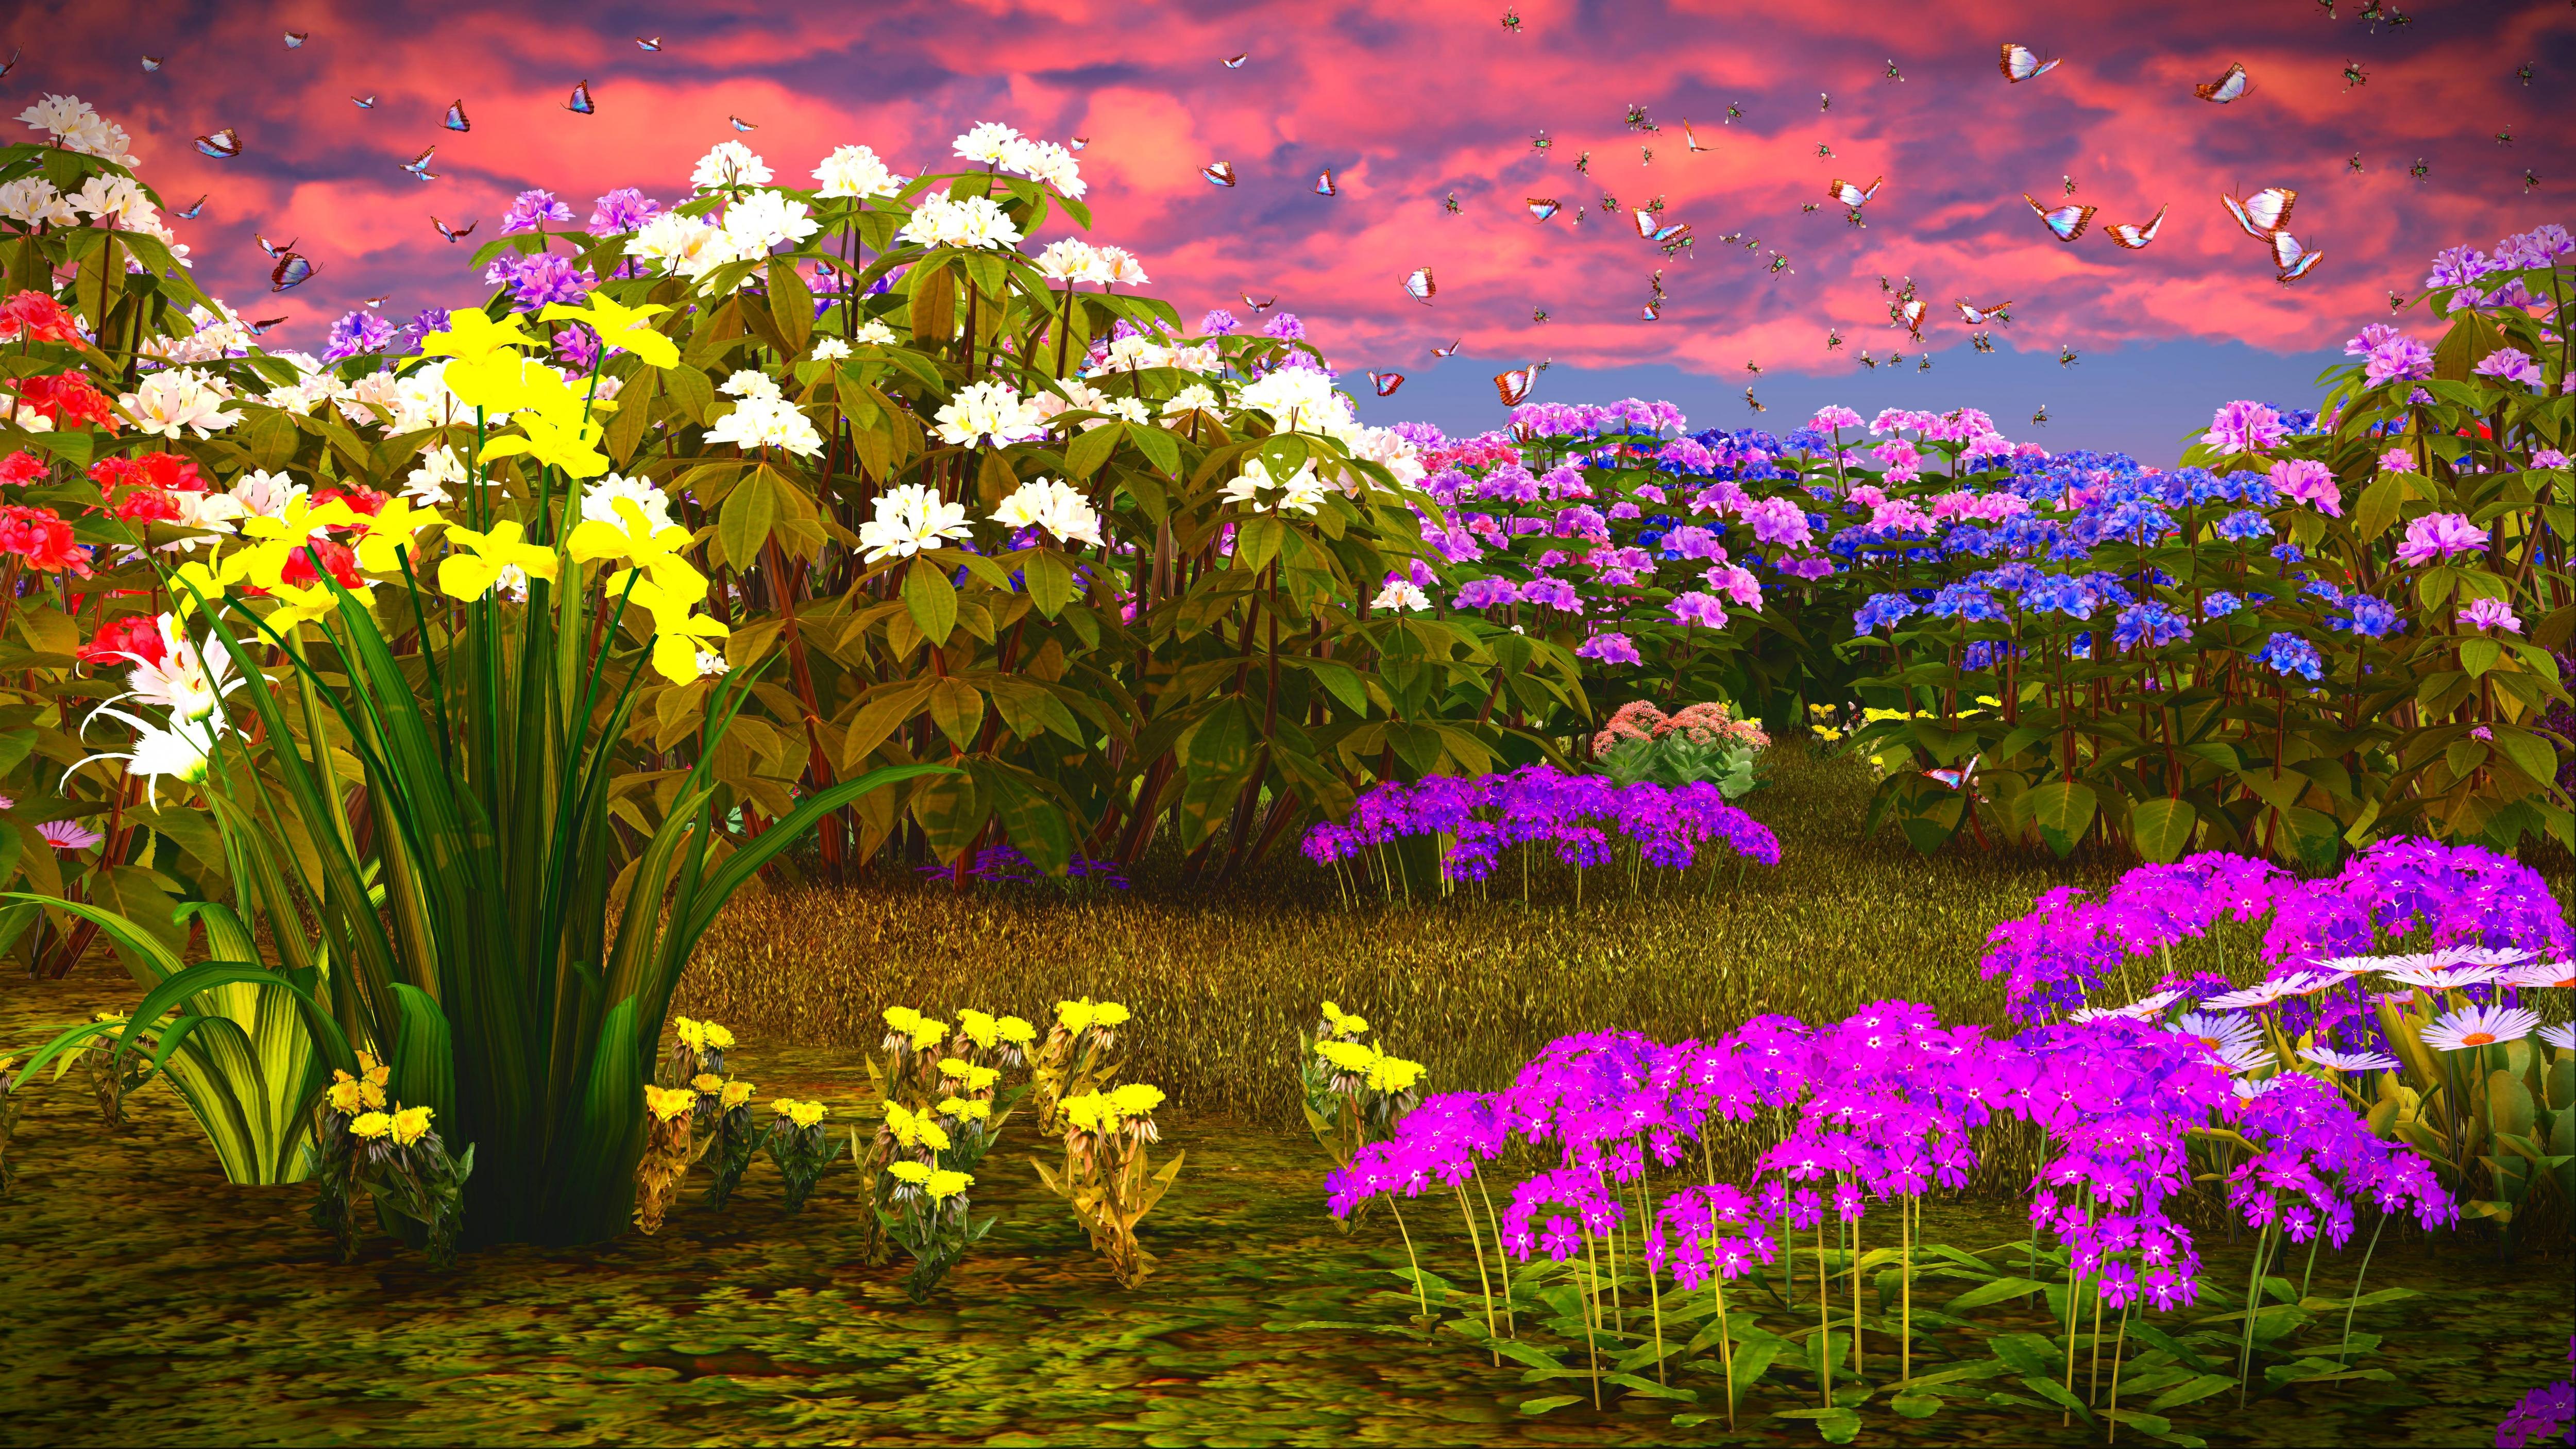 Fantasy meadow 4k ultra hd wallpaper background image - Flower wallpaper 3d pic ...